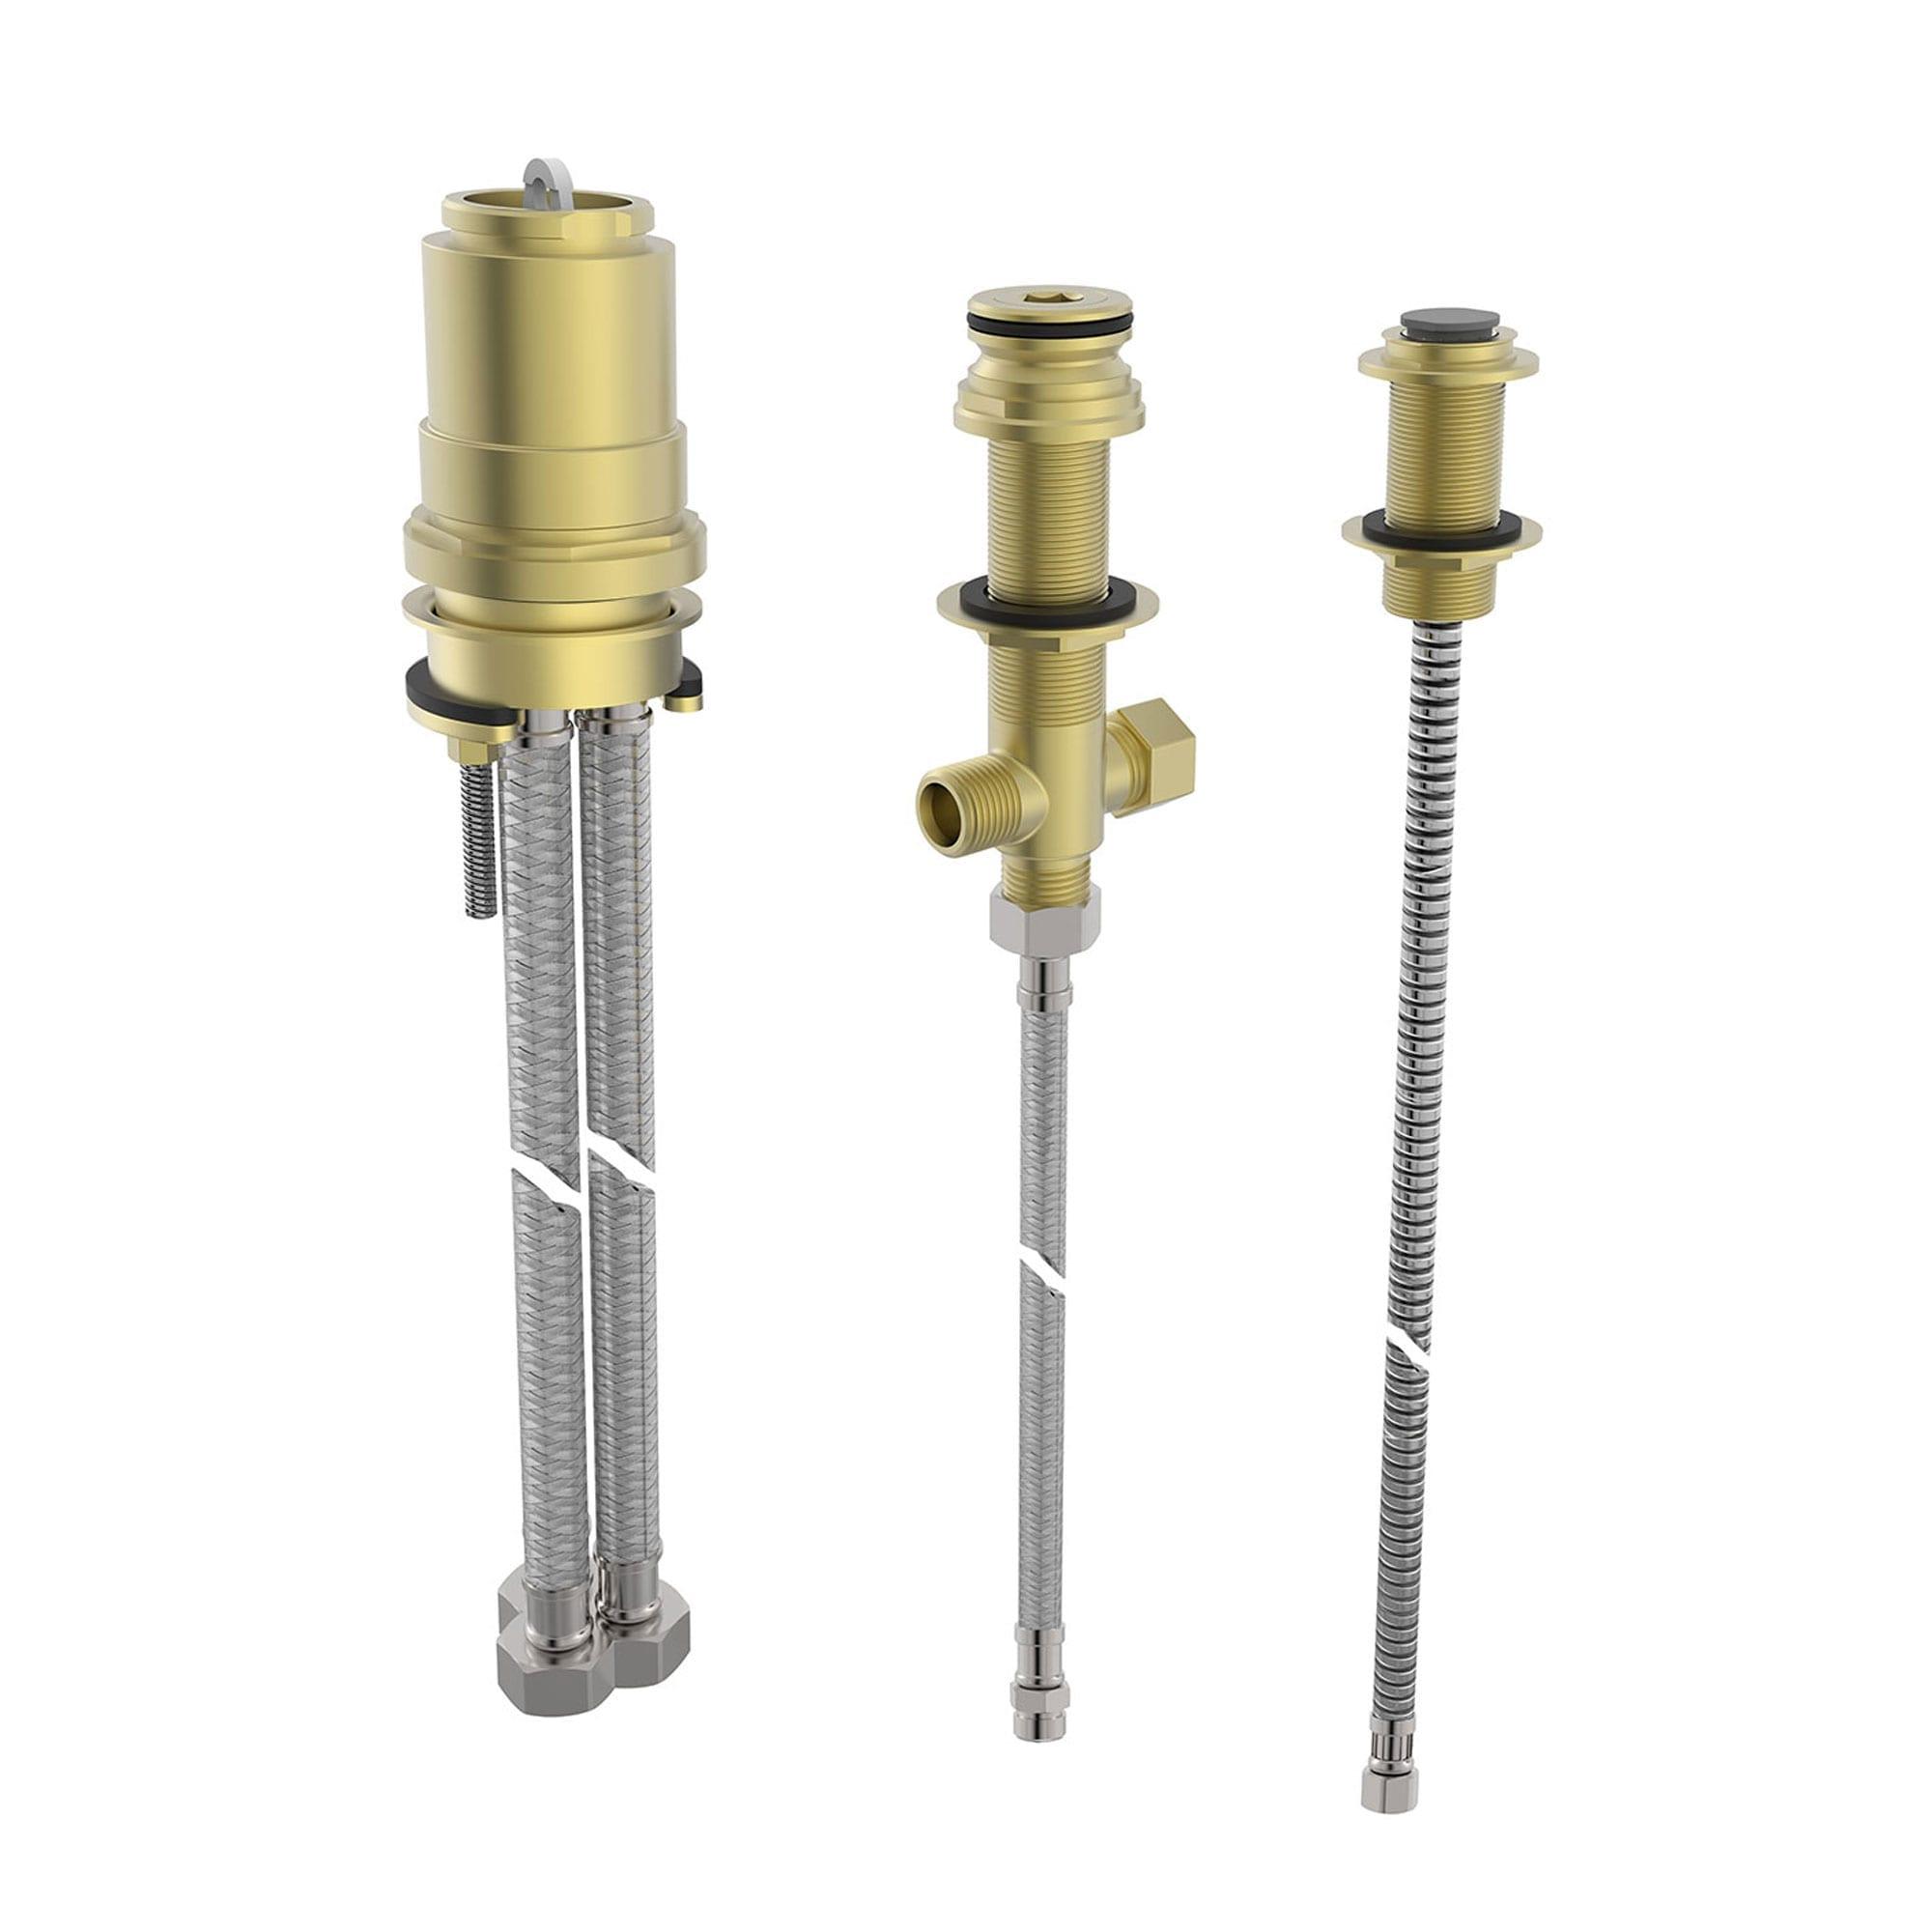 robinet pour baignoire installation primaire valve pression quilibr e pour baignoire. Black Bedroom Furniture Sets. Home Design Ideas